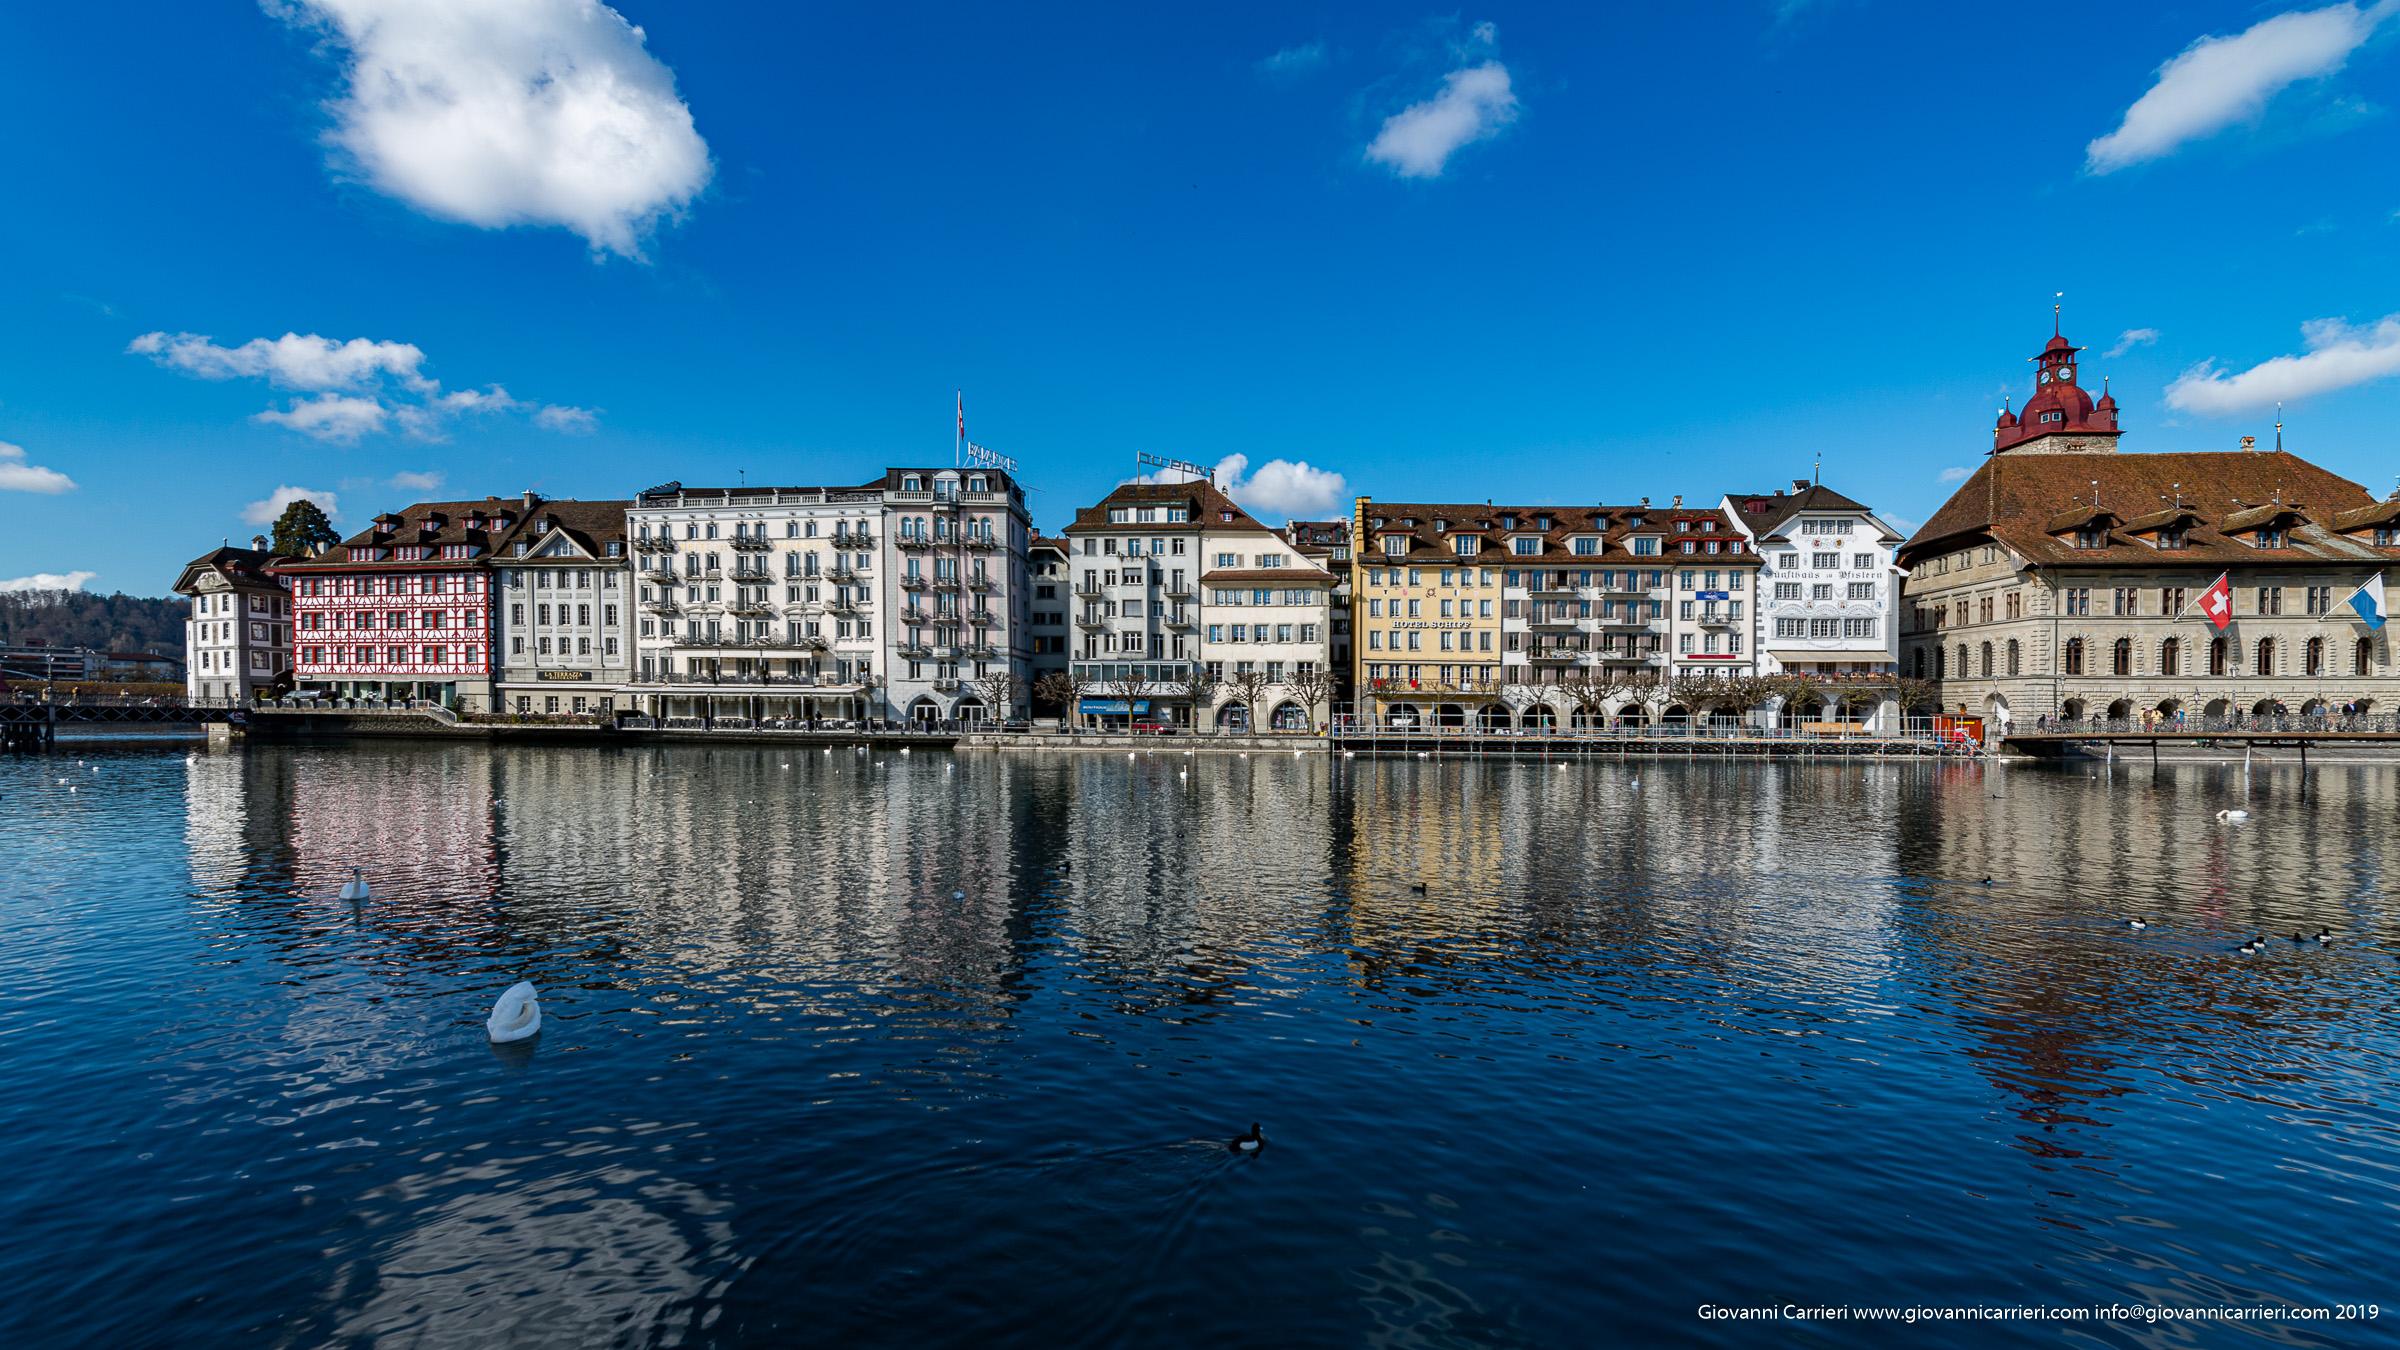 Il fiume Reuss e l'antica cittadina di Lucerna